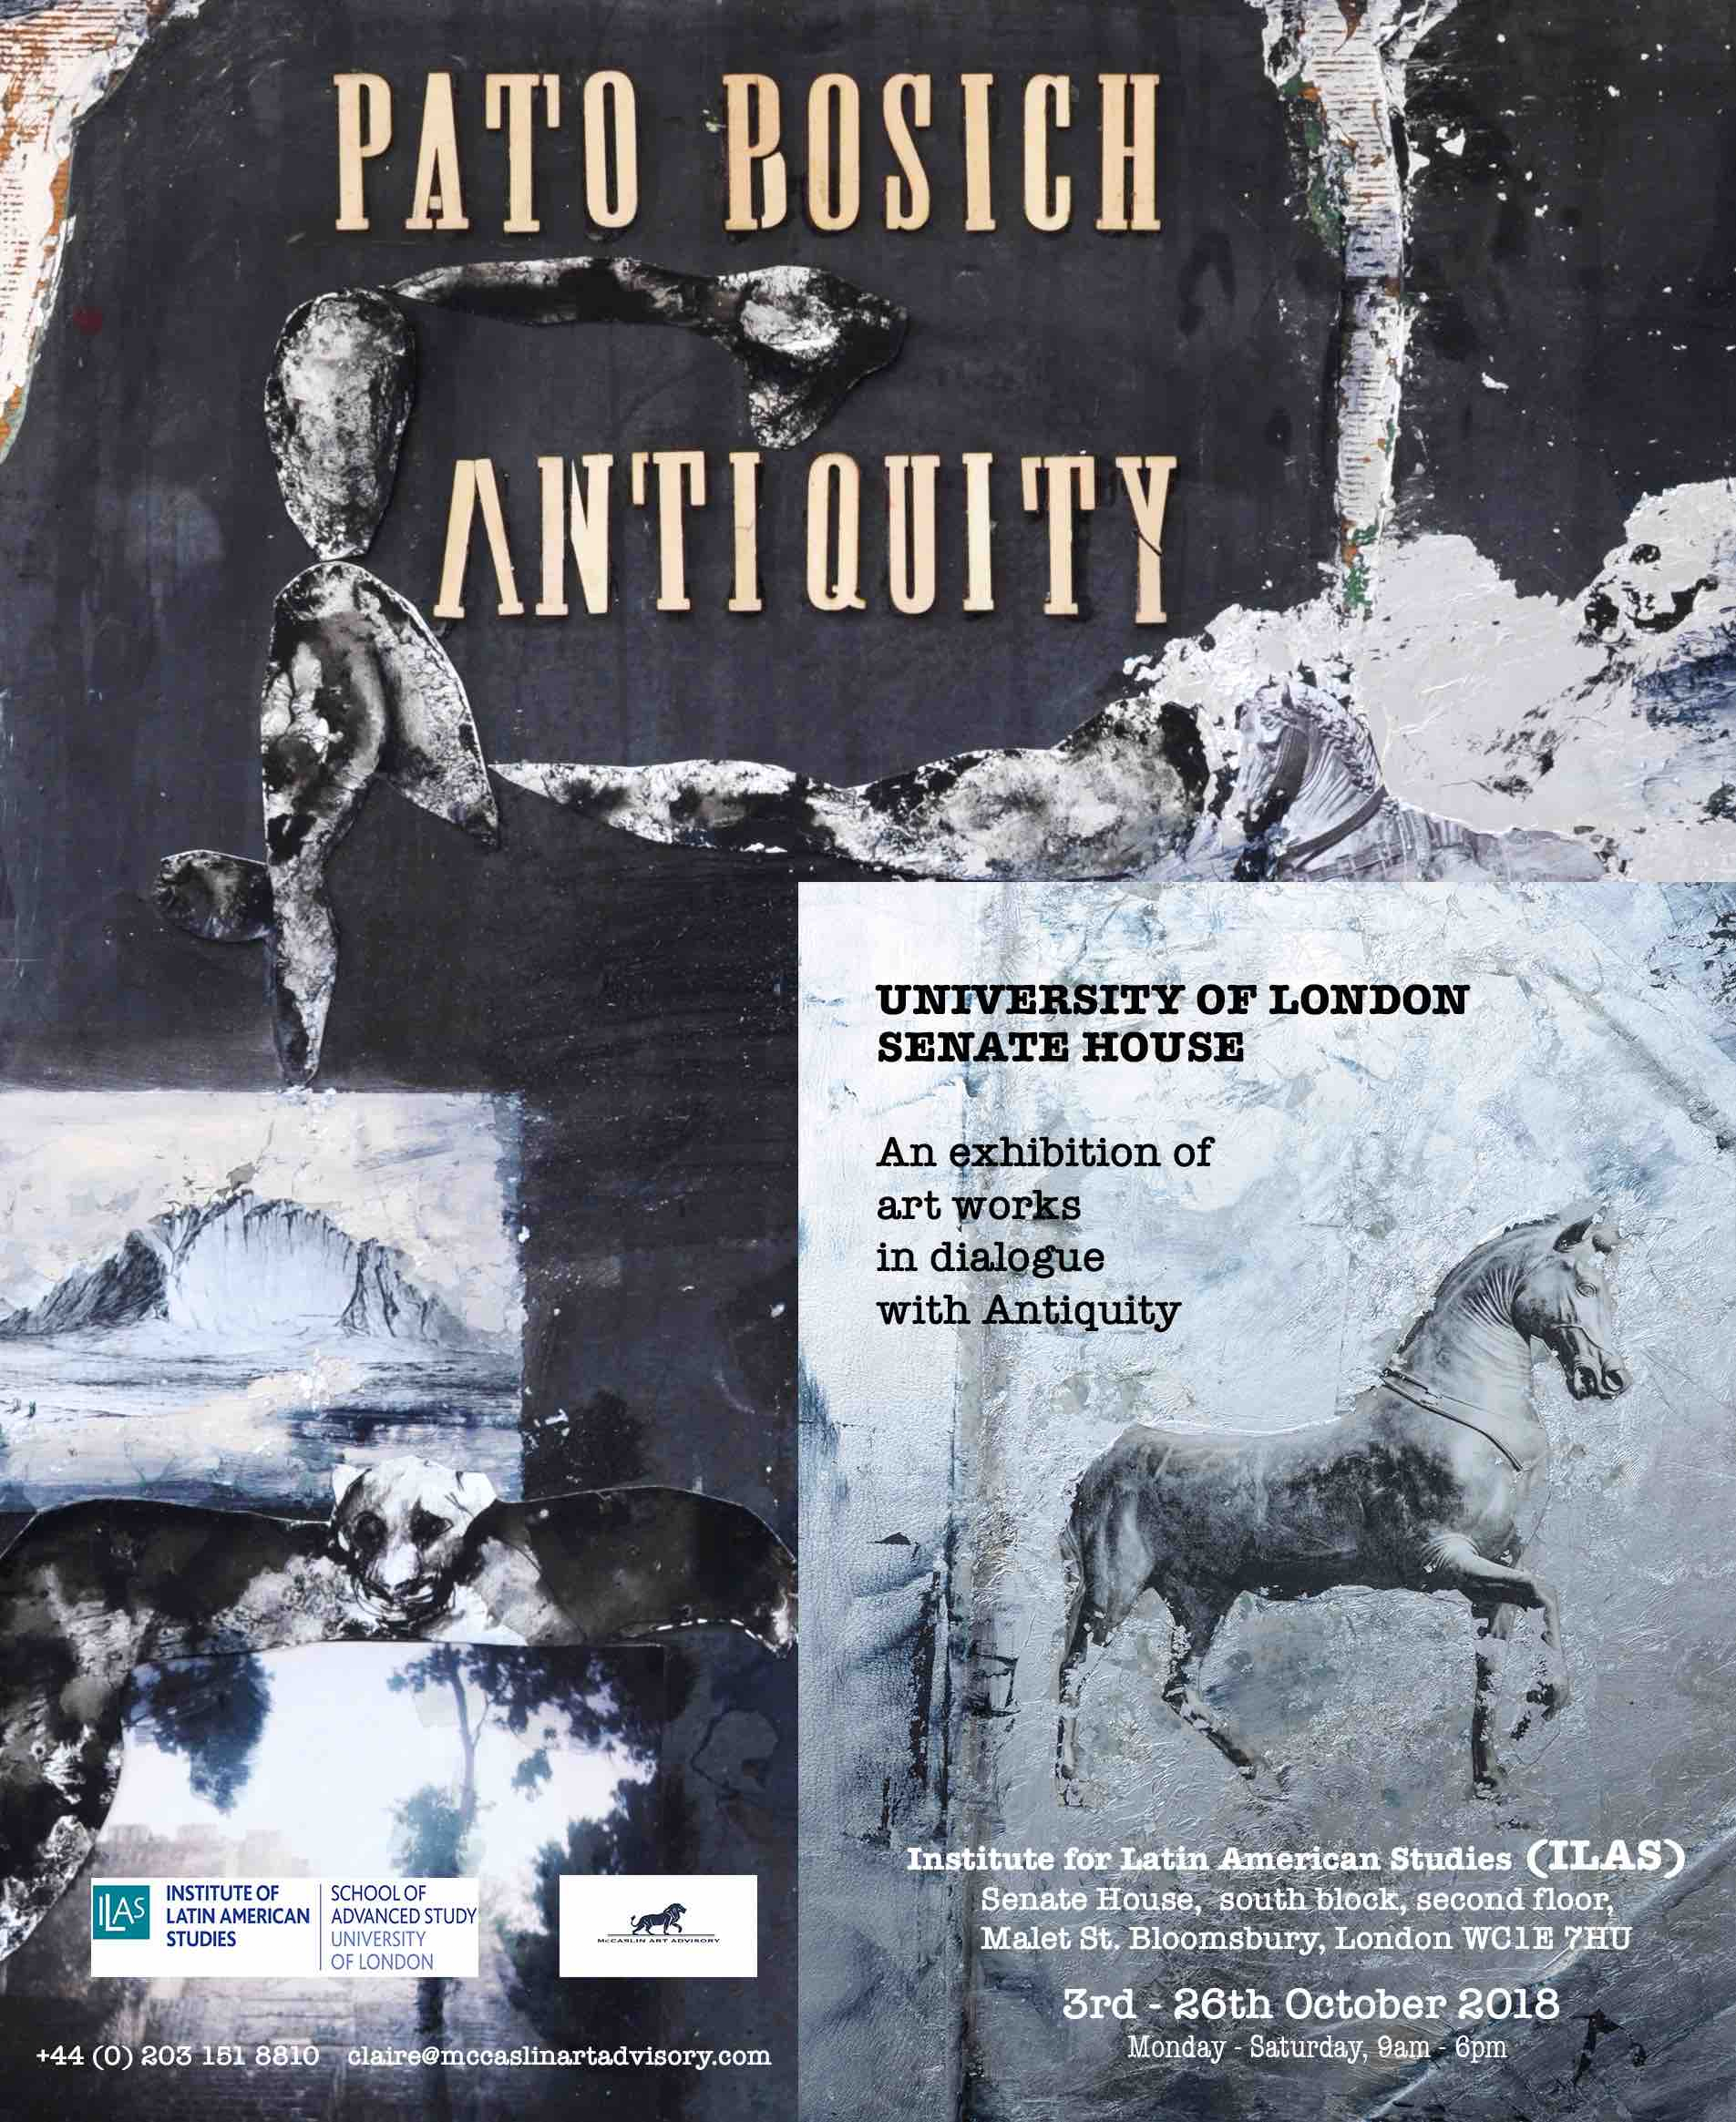 Antiquity – Pato Bosich